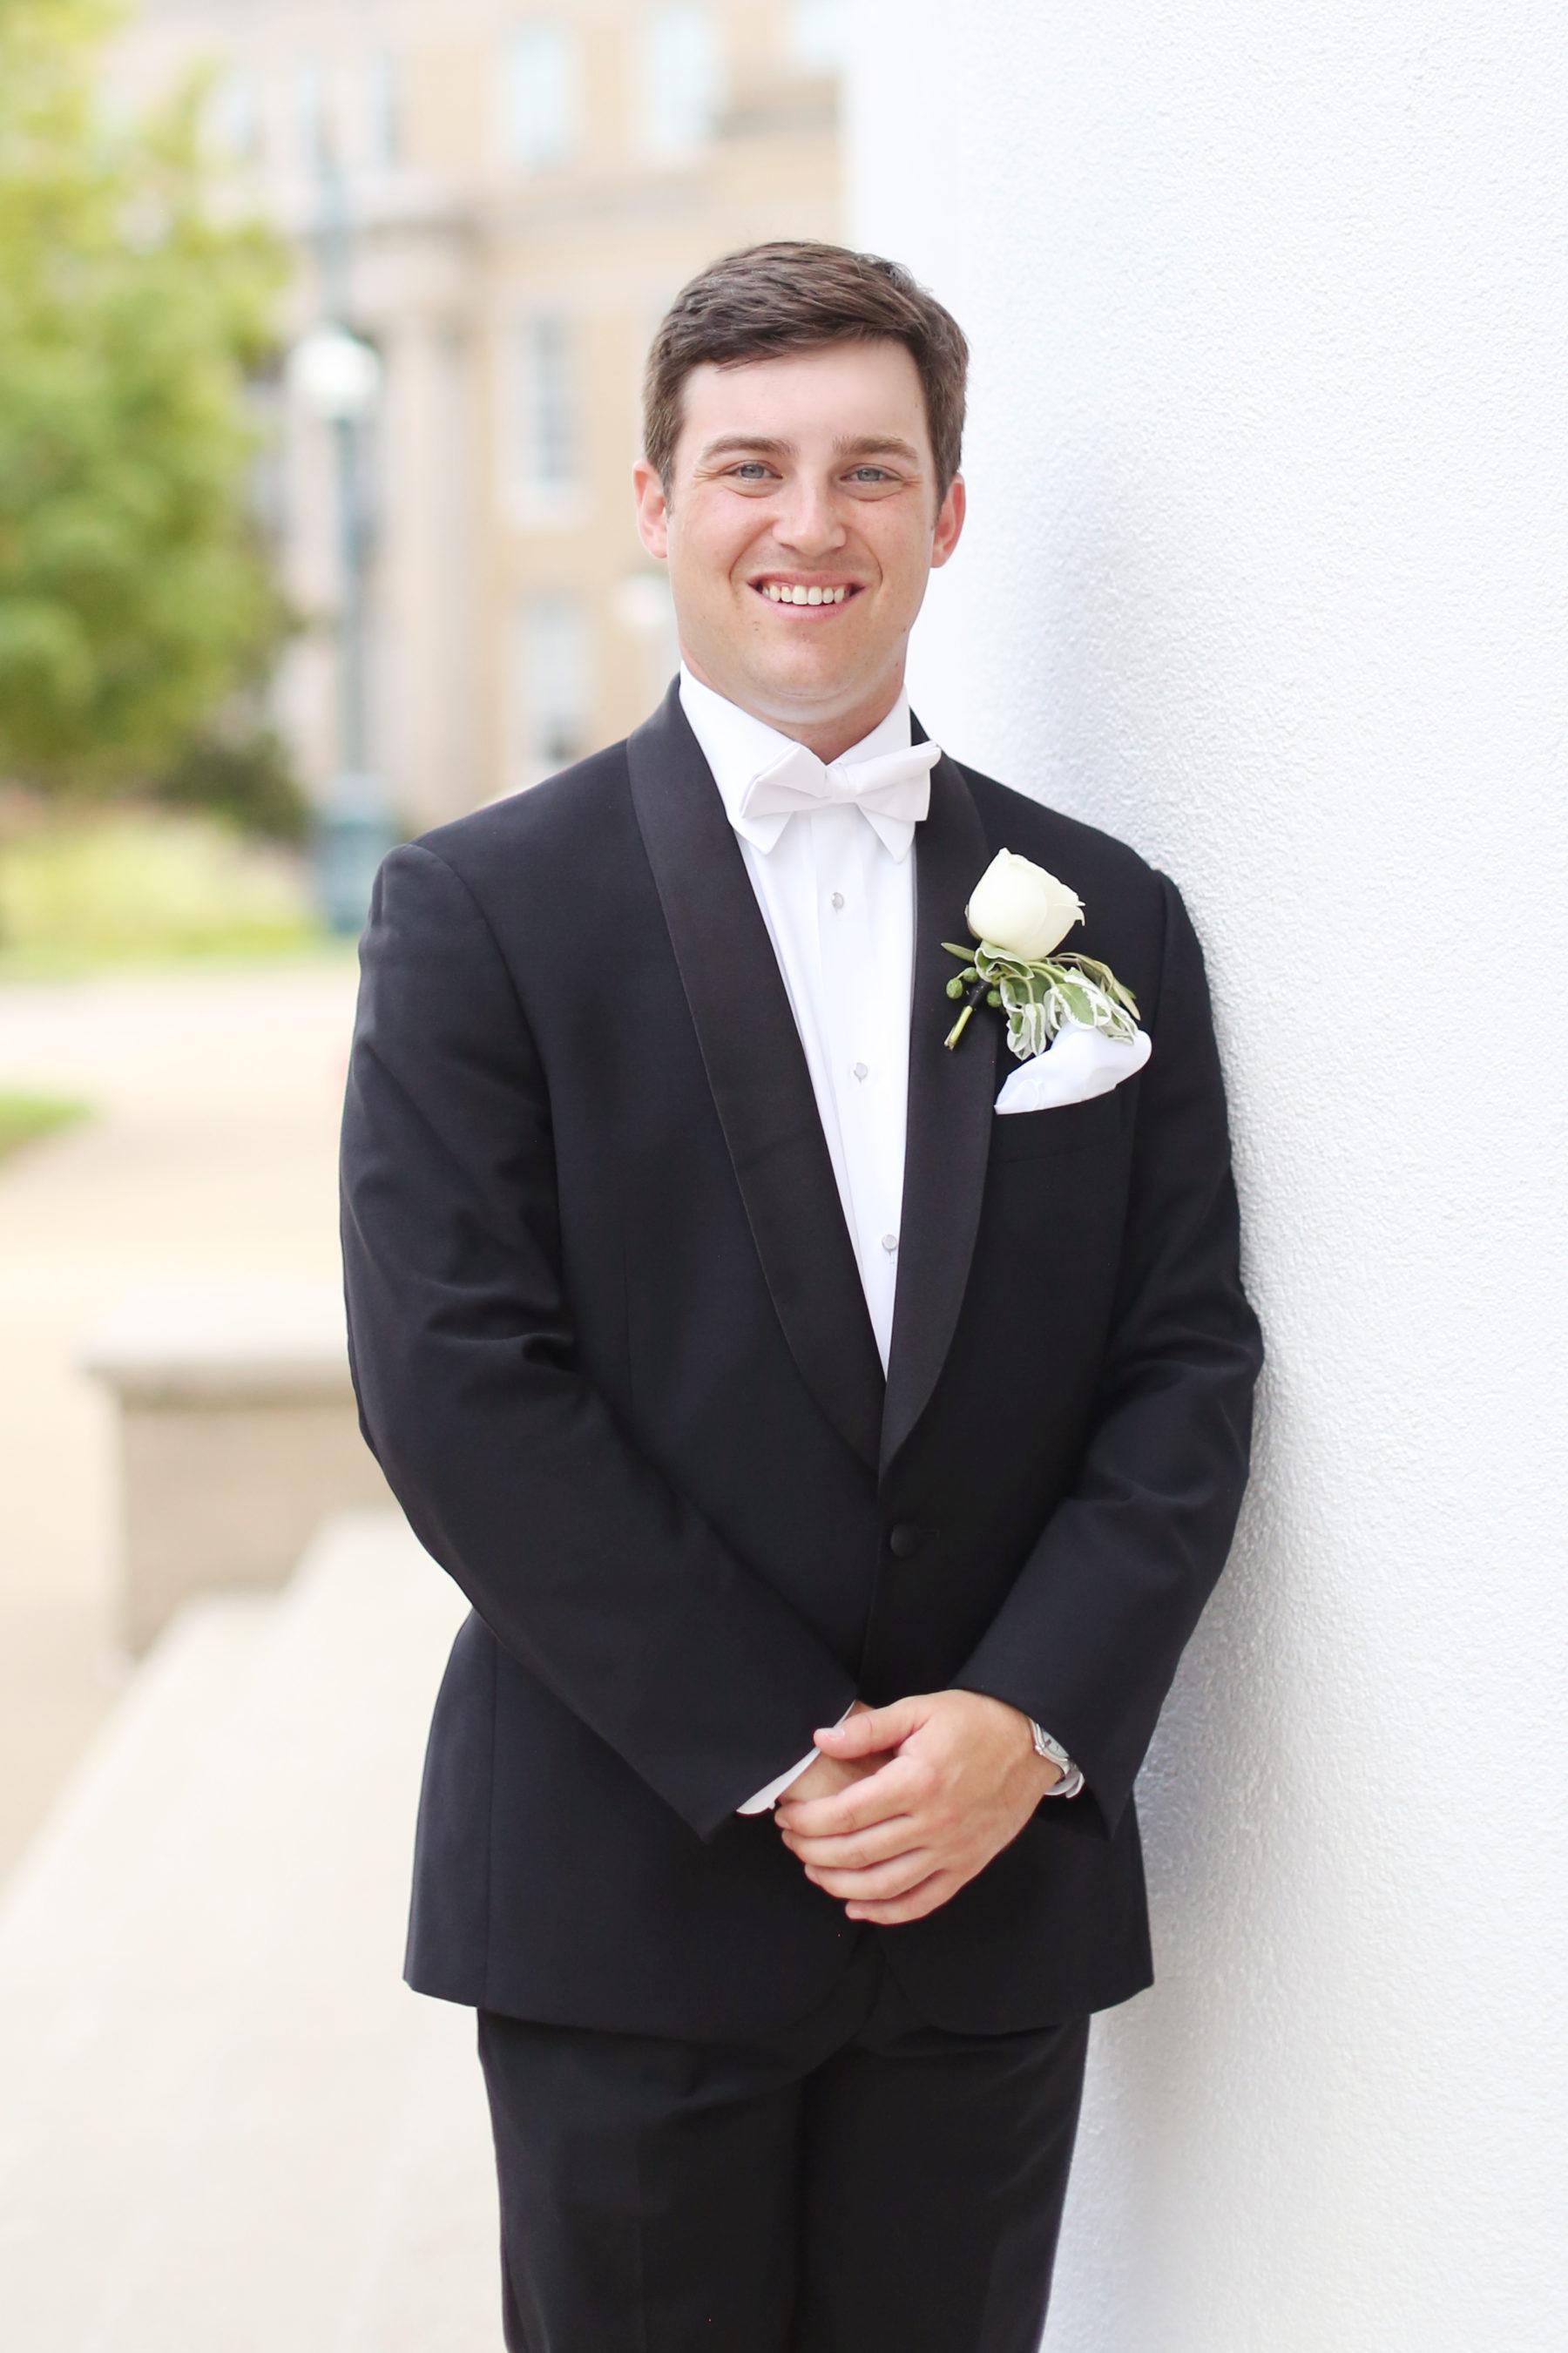 Grooms Portrait captured by Eliza Kennard Wedding Photography featured on Nashville Bride Guide